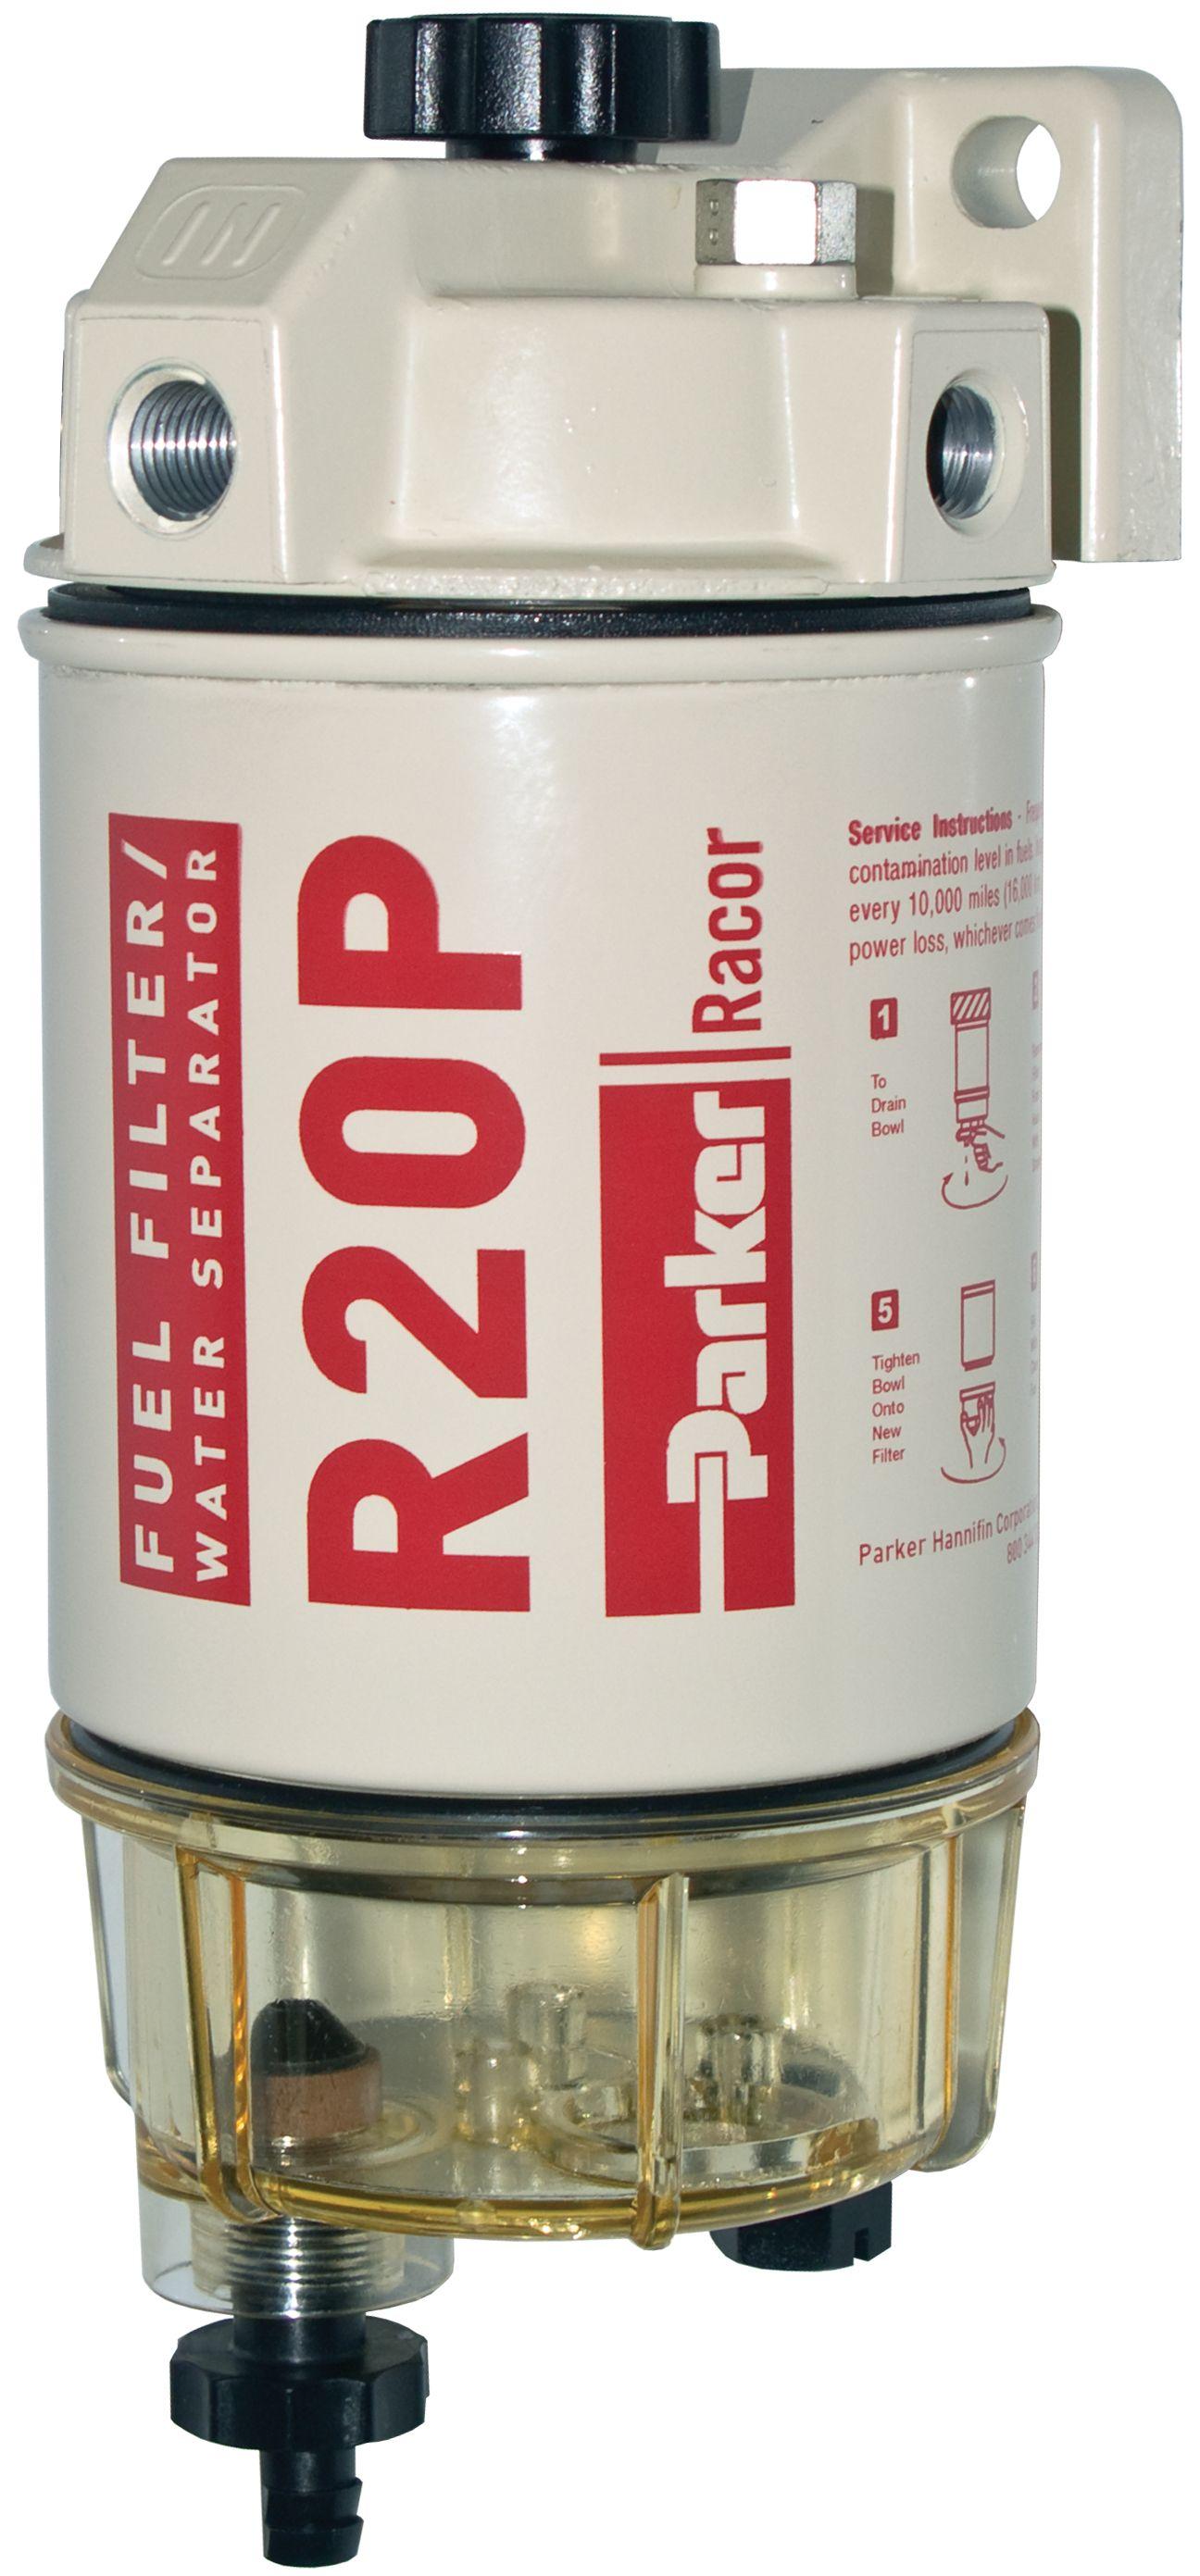 Racor 230r 230r2 230r10 230r30 Series Diesel Spin On Filter Fuel Housing Separators